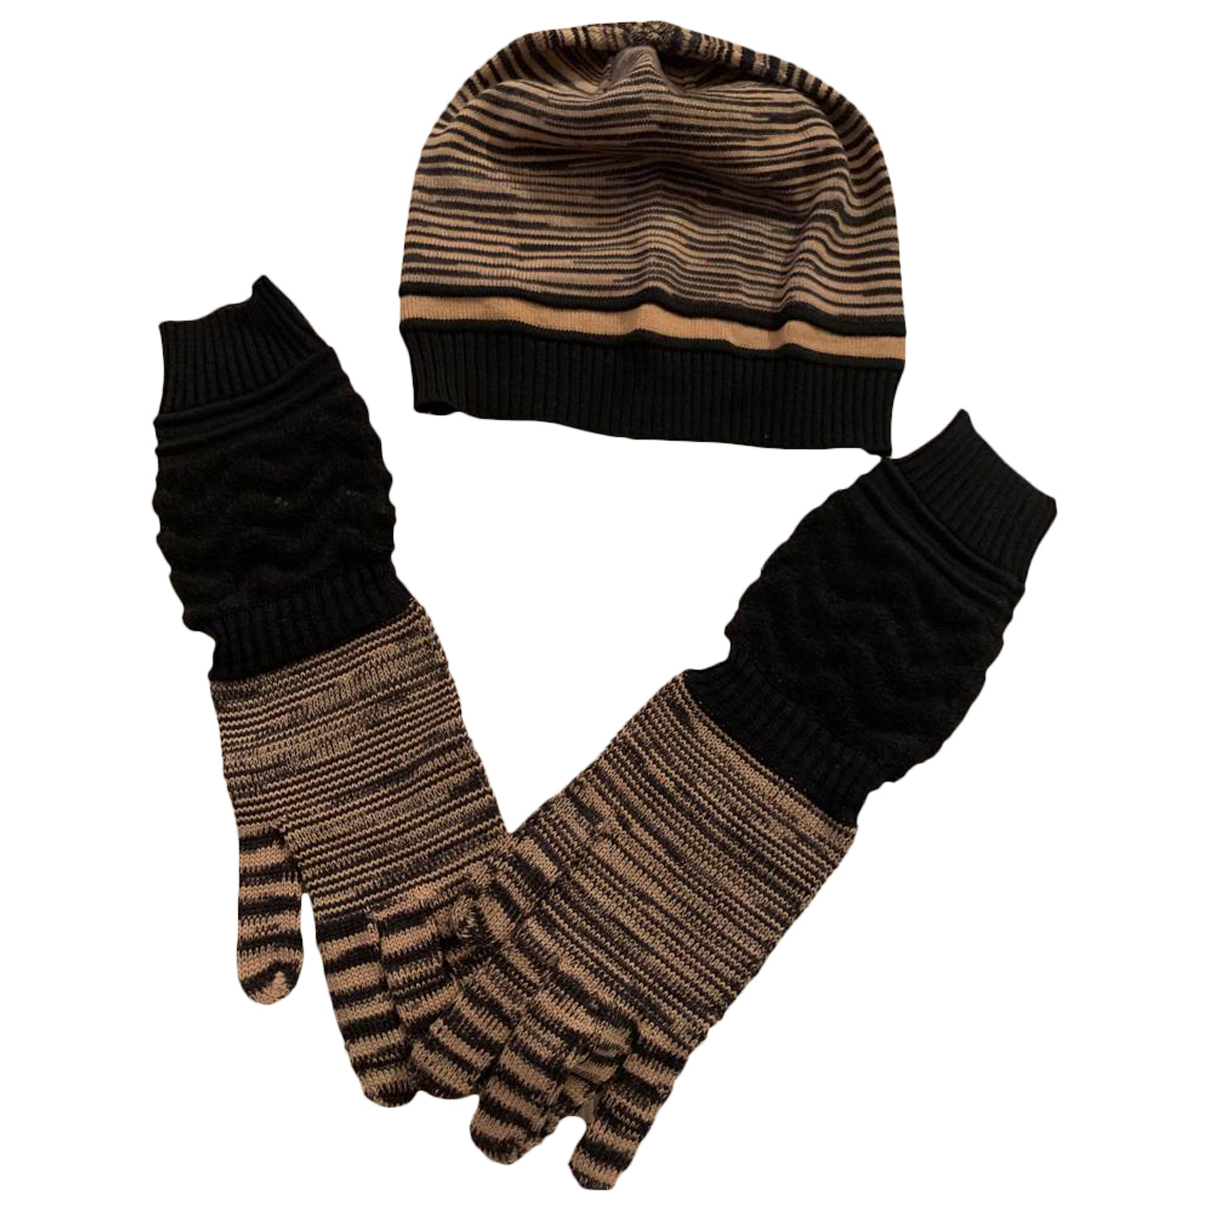 Missoni \N Handschuhe in  Braun Wolle